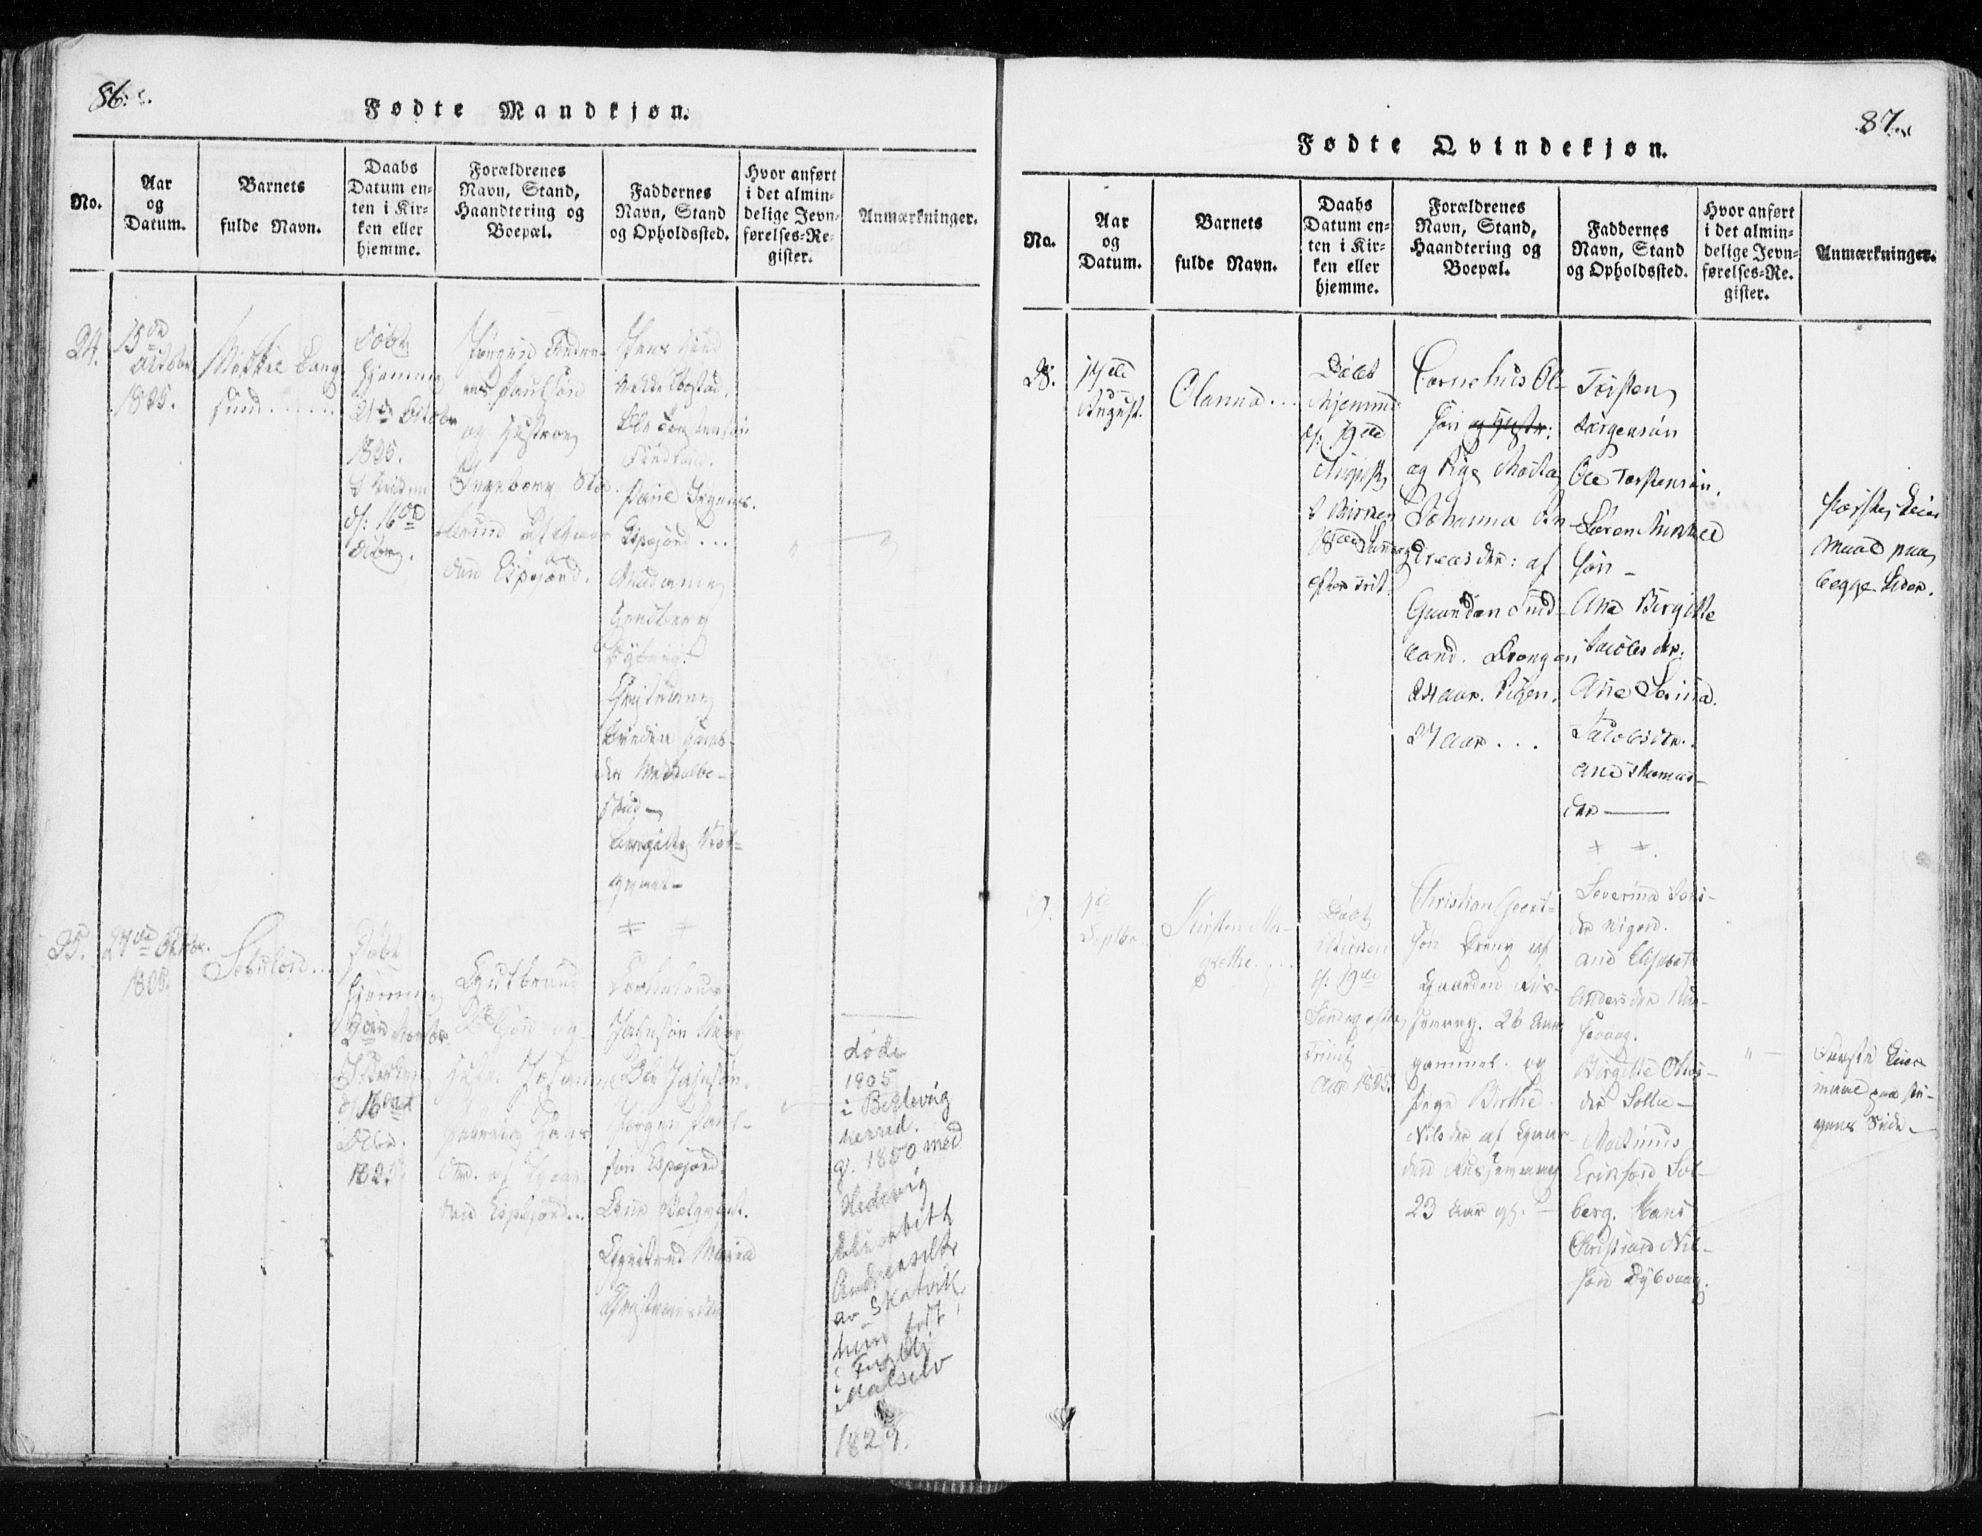 SATØ, Tranøy sokneprestkontor, I/Ia/Iaa/L0004kirke: Ministerialbok nr. 4, 1820-1829, s. 86-87